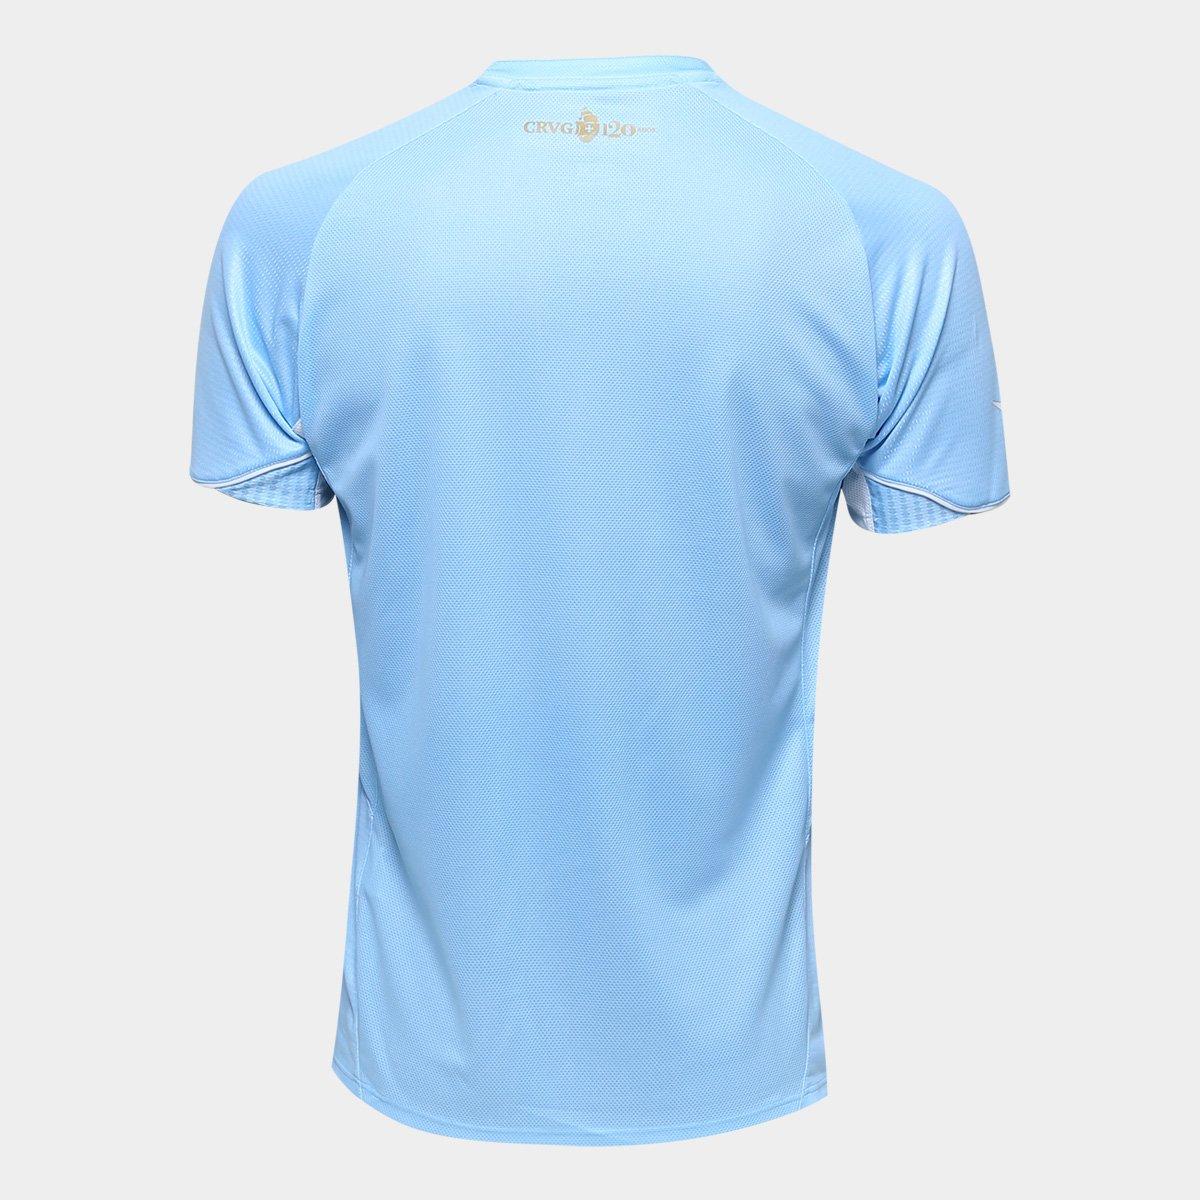 ... Camisa de Goleiro Vasco I 2018 s n° Torcedor Diadora Masculina ... dc10899179c13